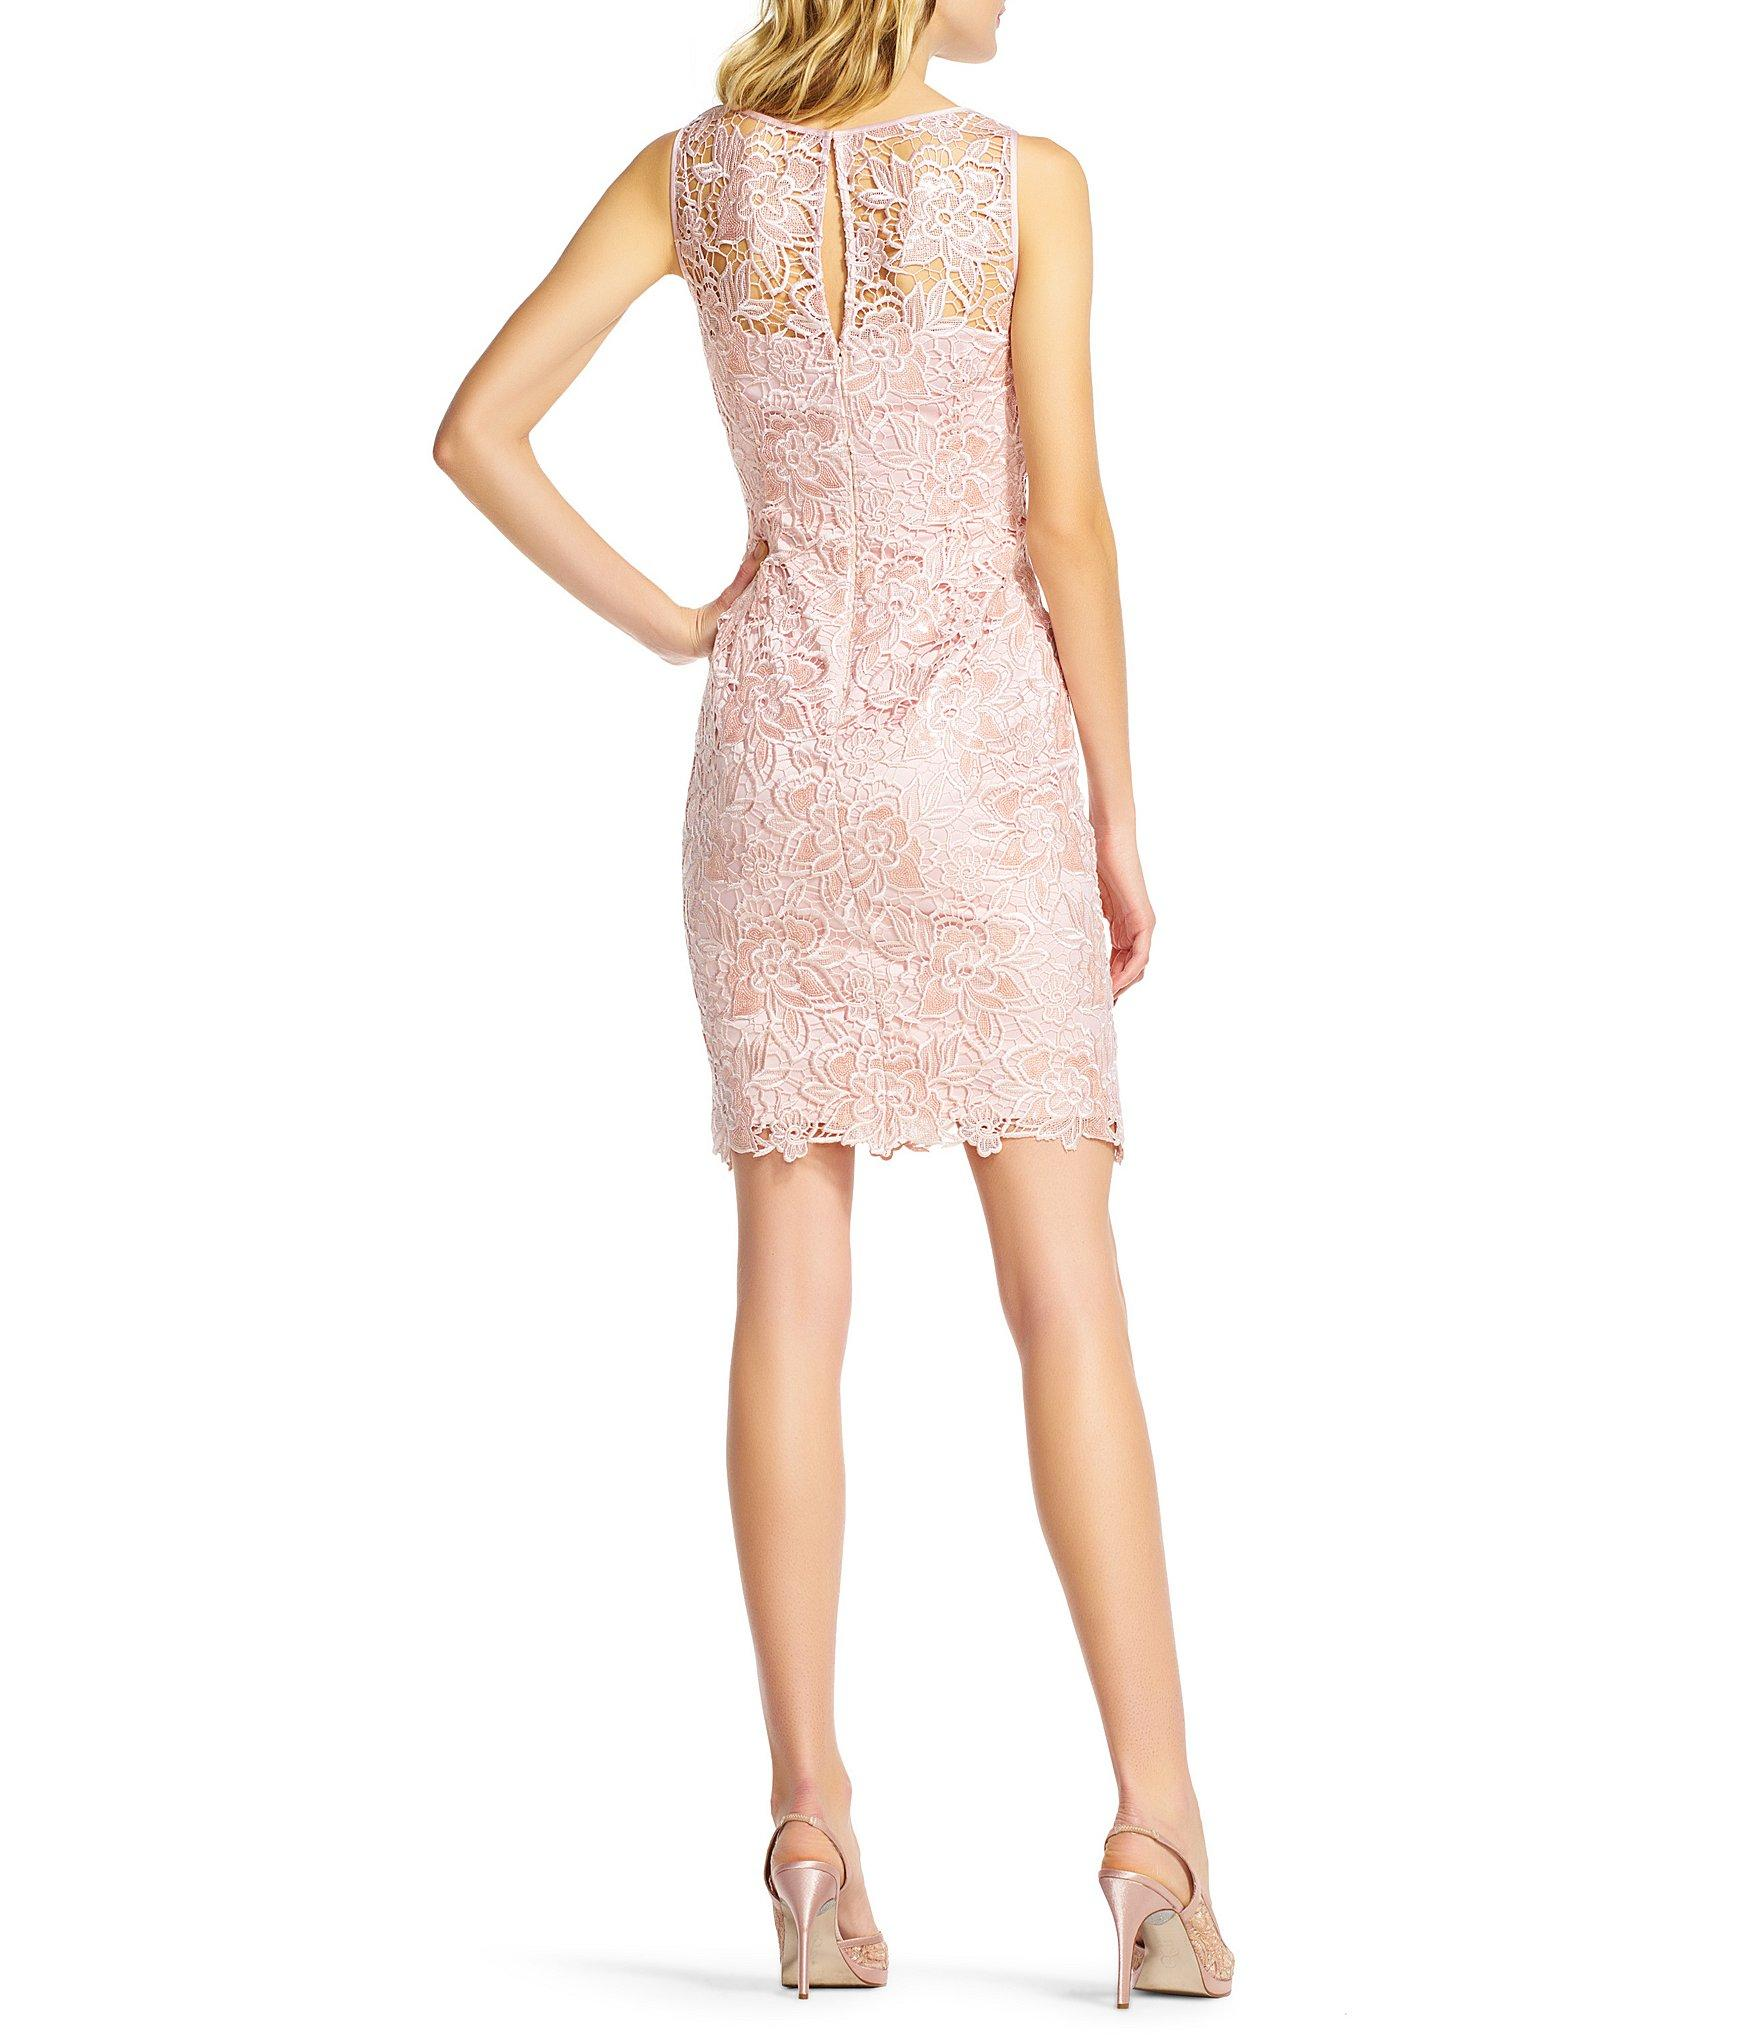 ADRIANNA PAPELL Womens Red Beaded Sleeveless Asymetrical Neckline Knee Length Sheath Evening Dress Size: 6 ADRIANNA PAPELL. Lace Sleeveless .